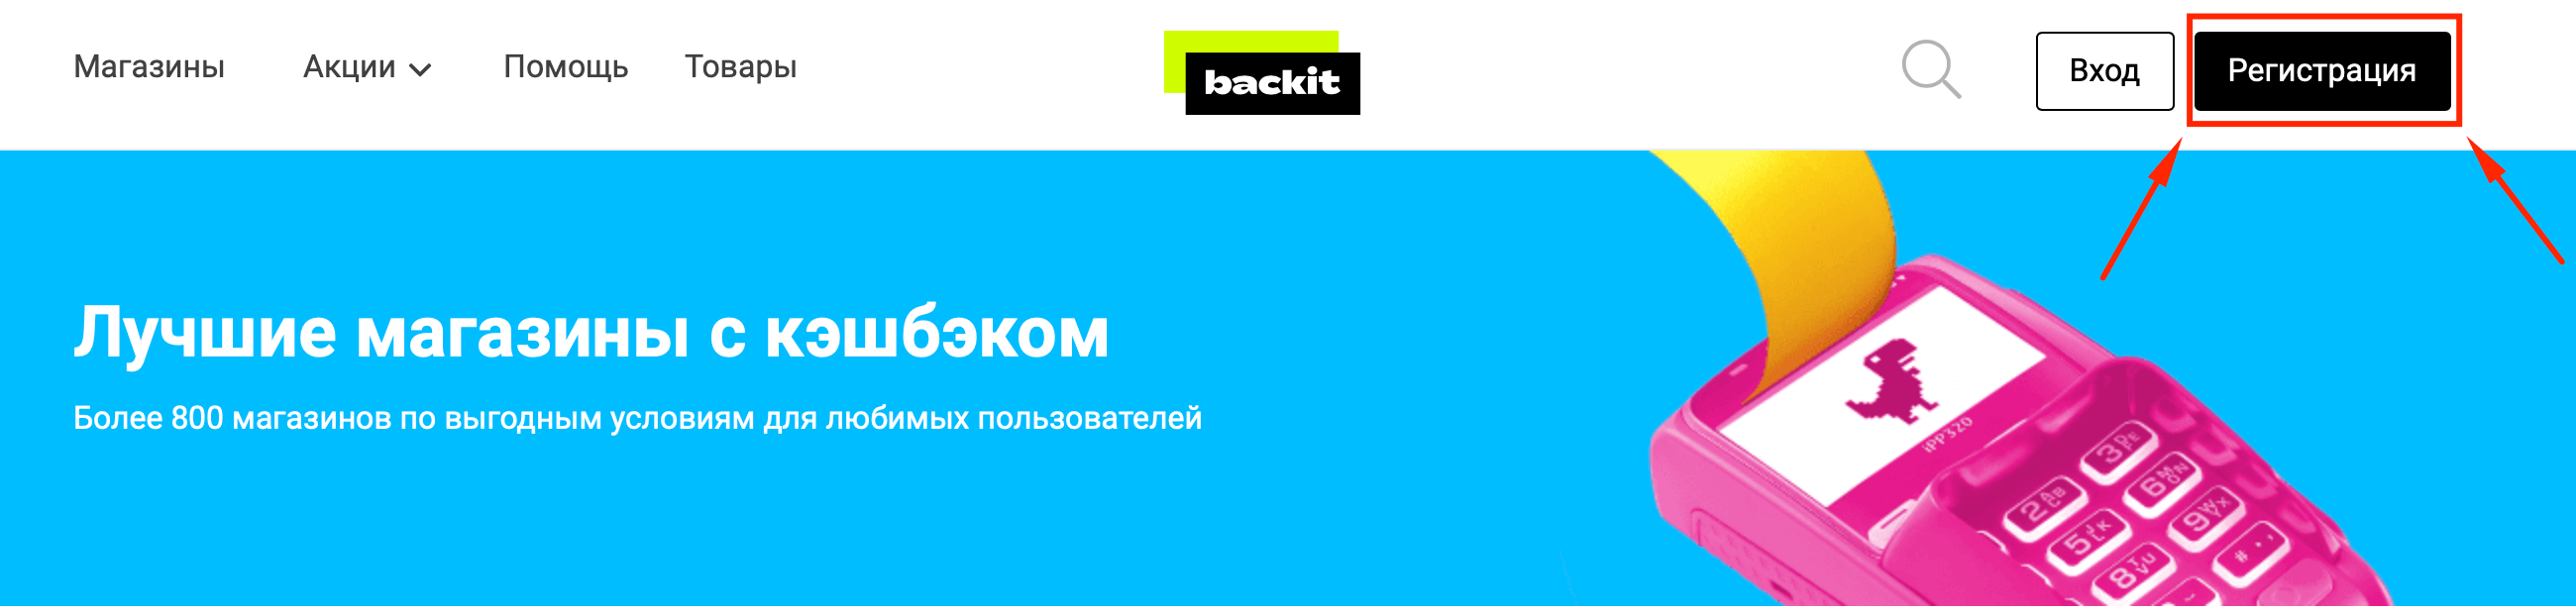 регистрация в backit